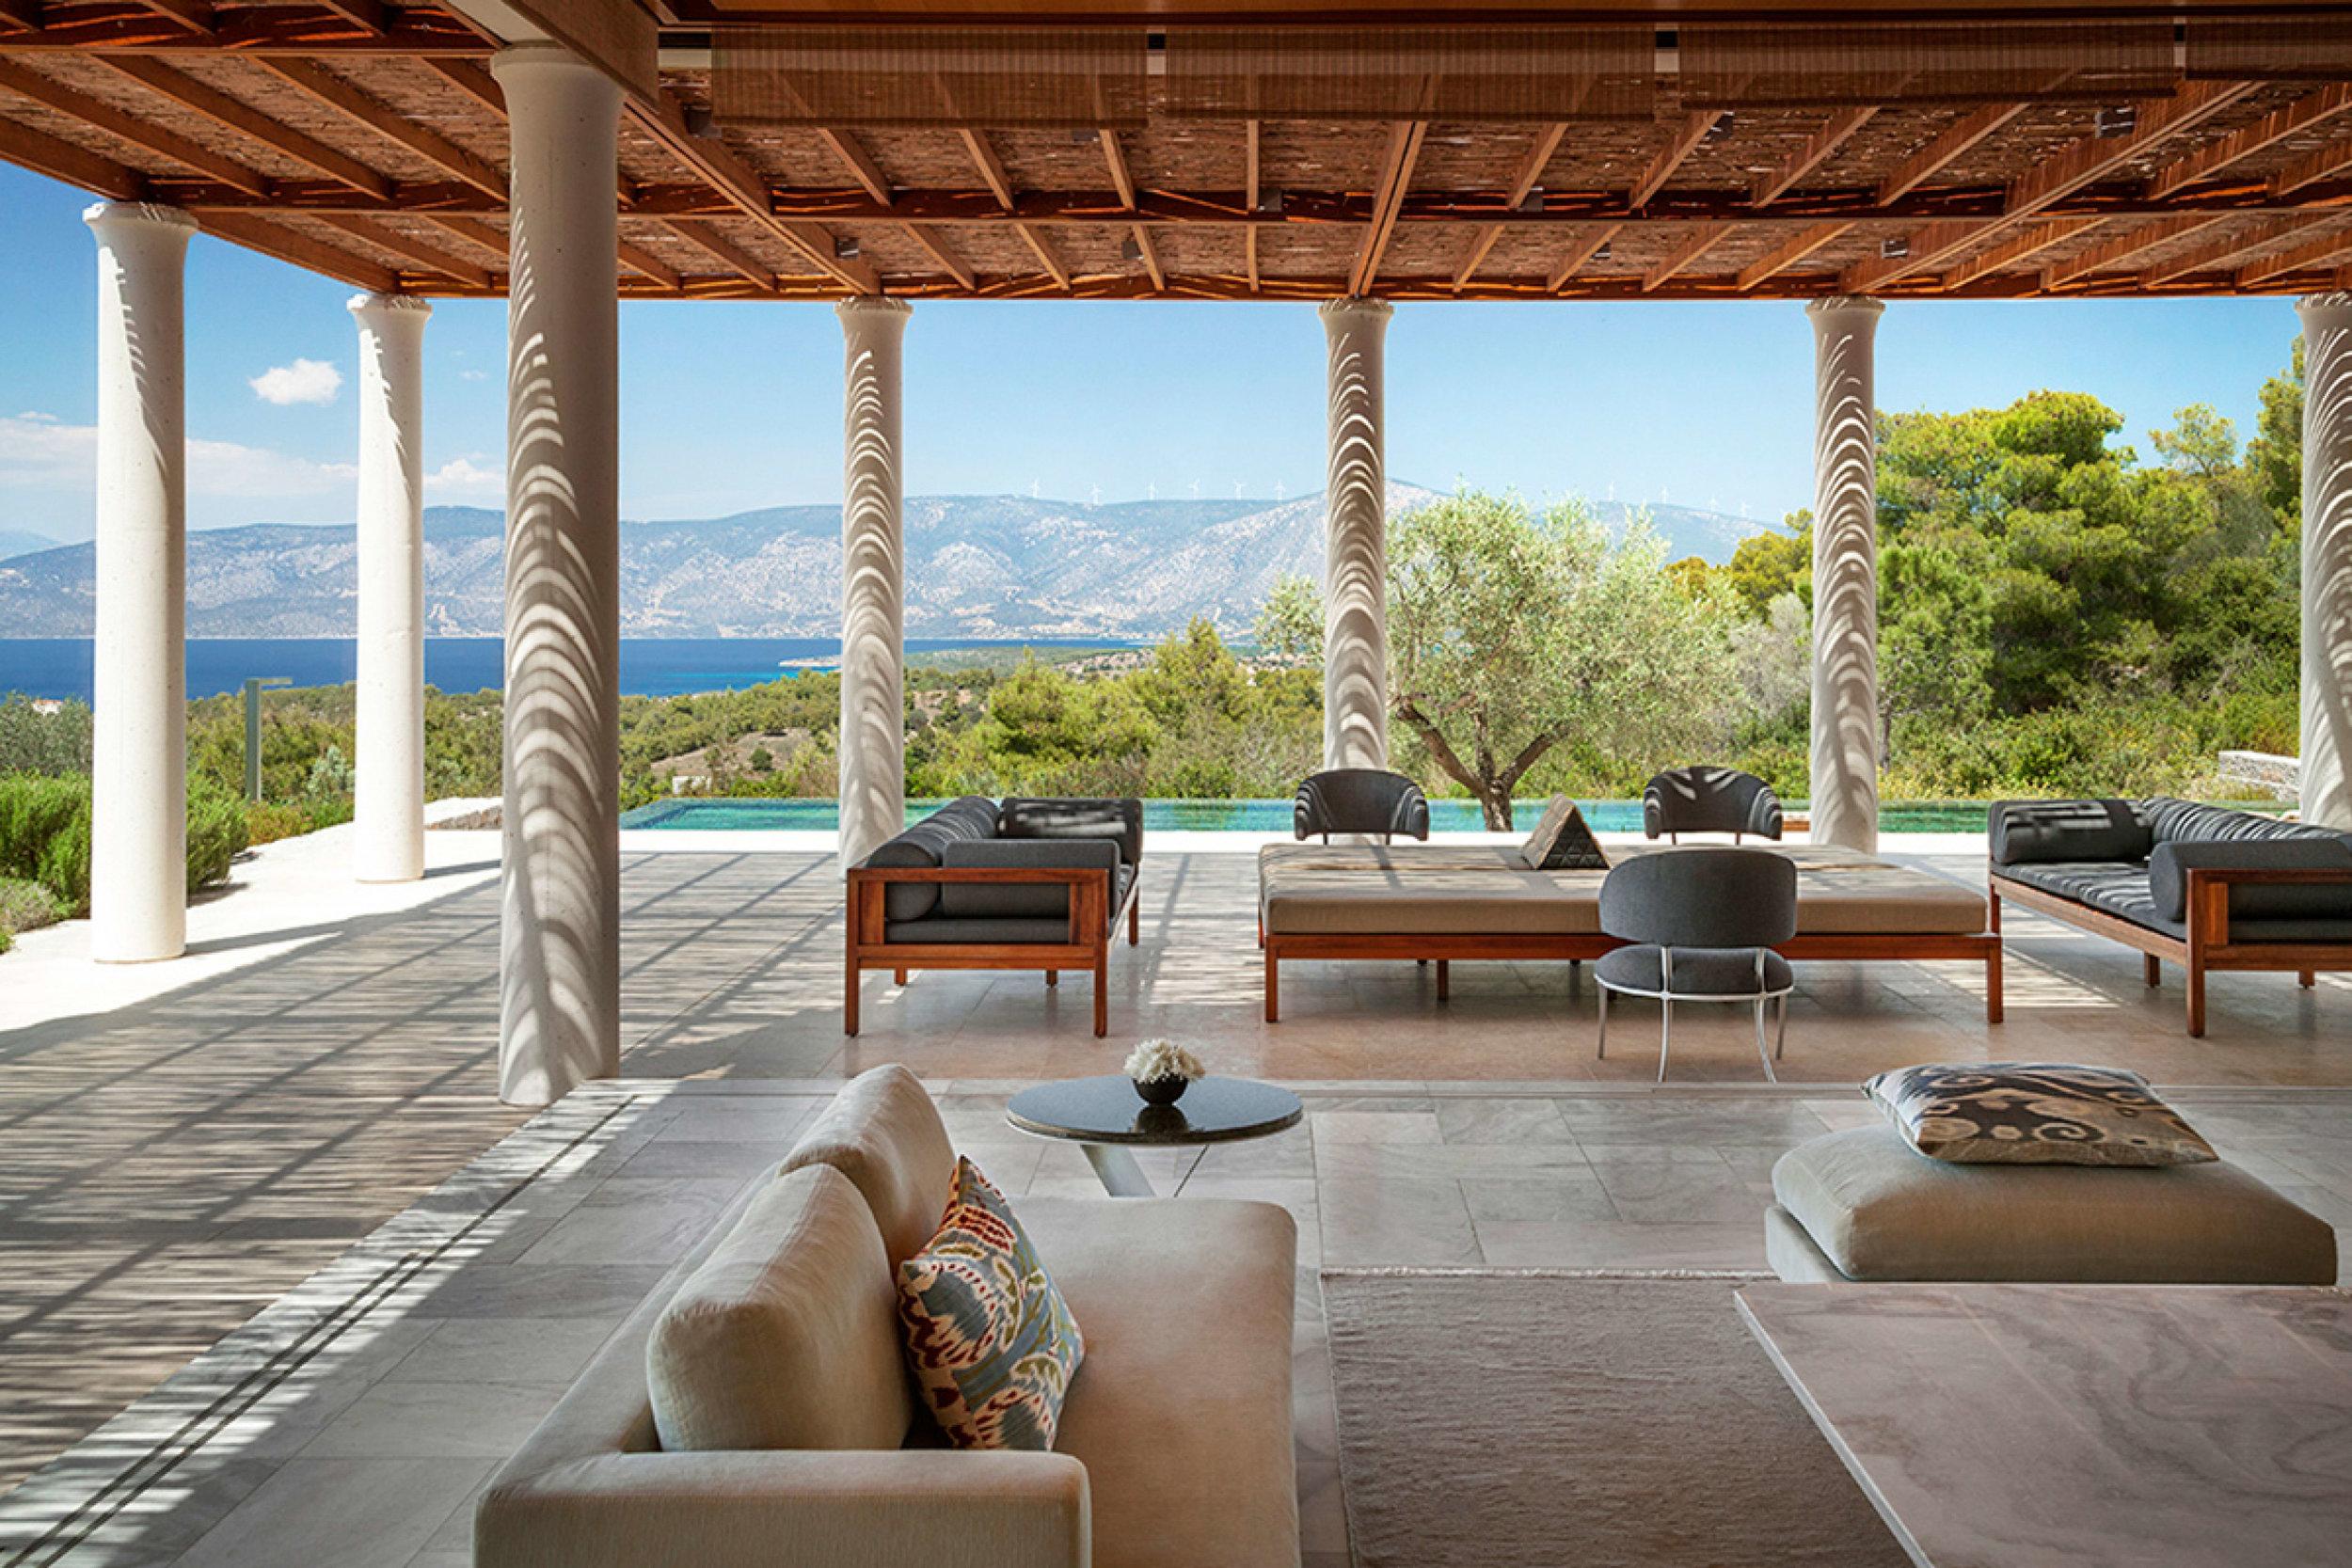 amanzoe-villas-living-room-terrace-1200x800.jpg